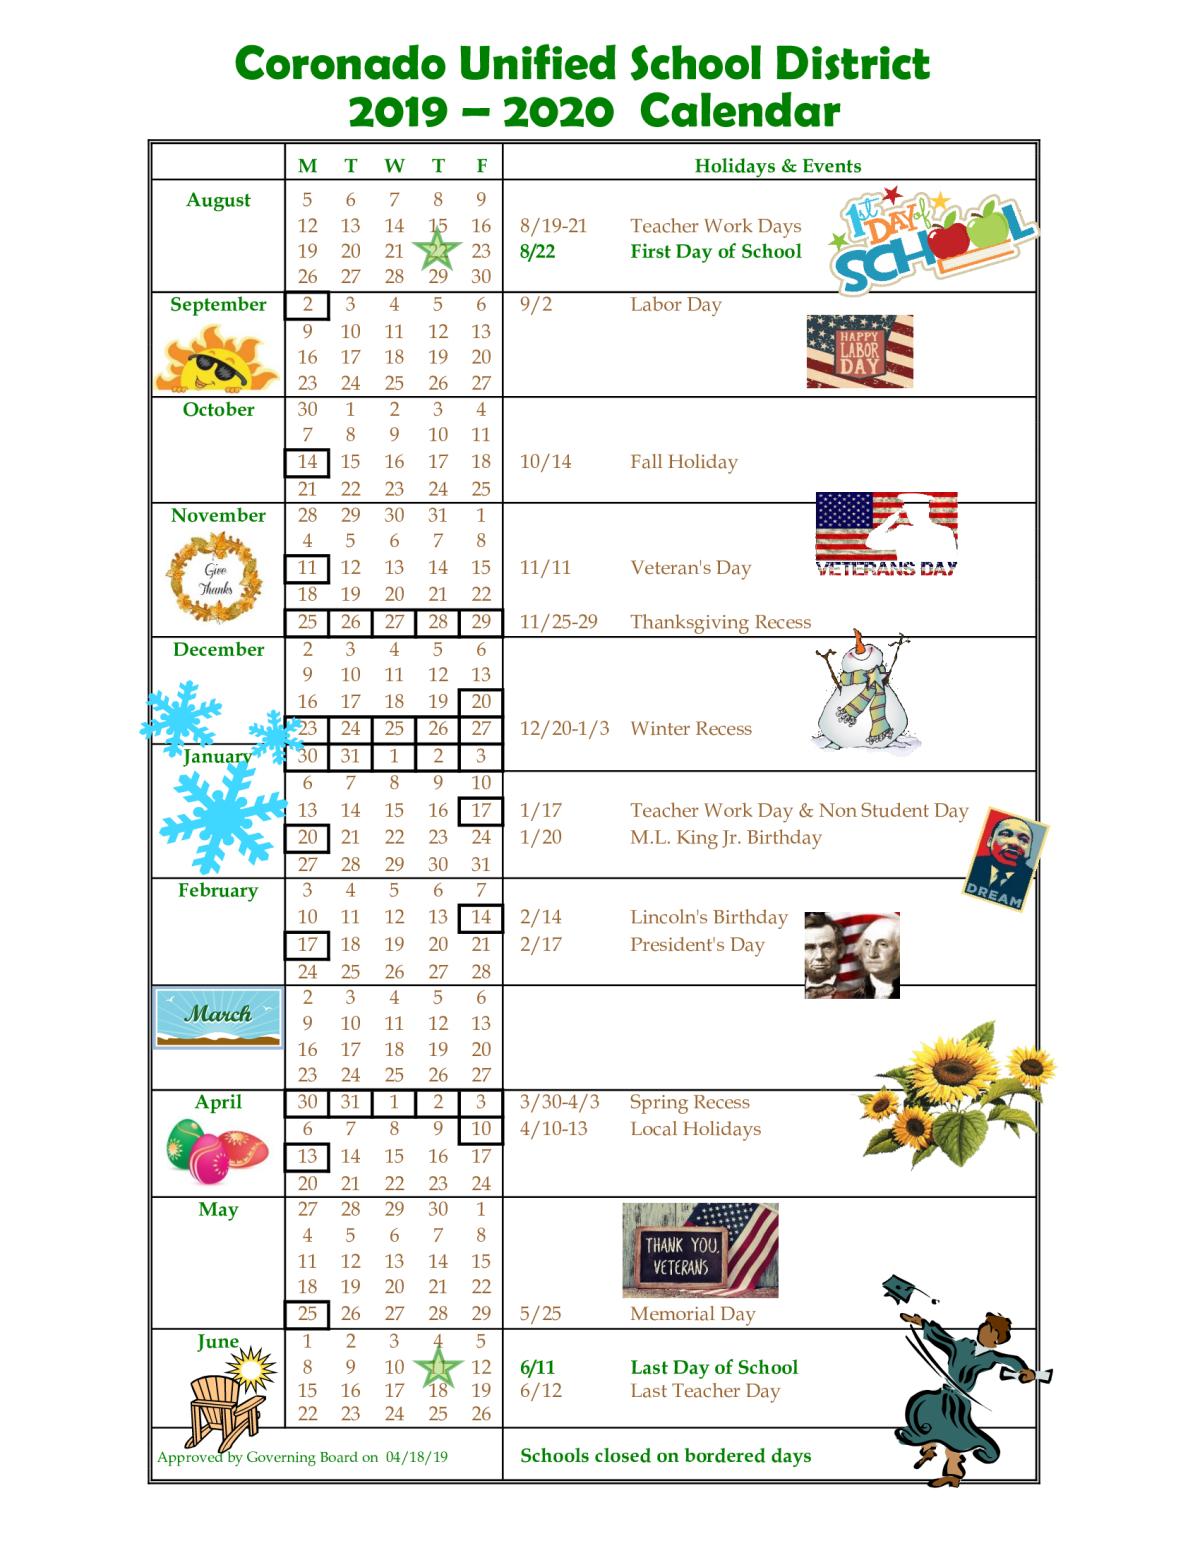 Cusd Calendar For 2019 2020 | Coronado Middle School With Regard To Oceanside Unified School District Calendar